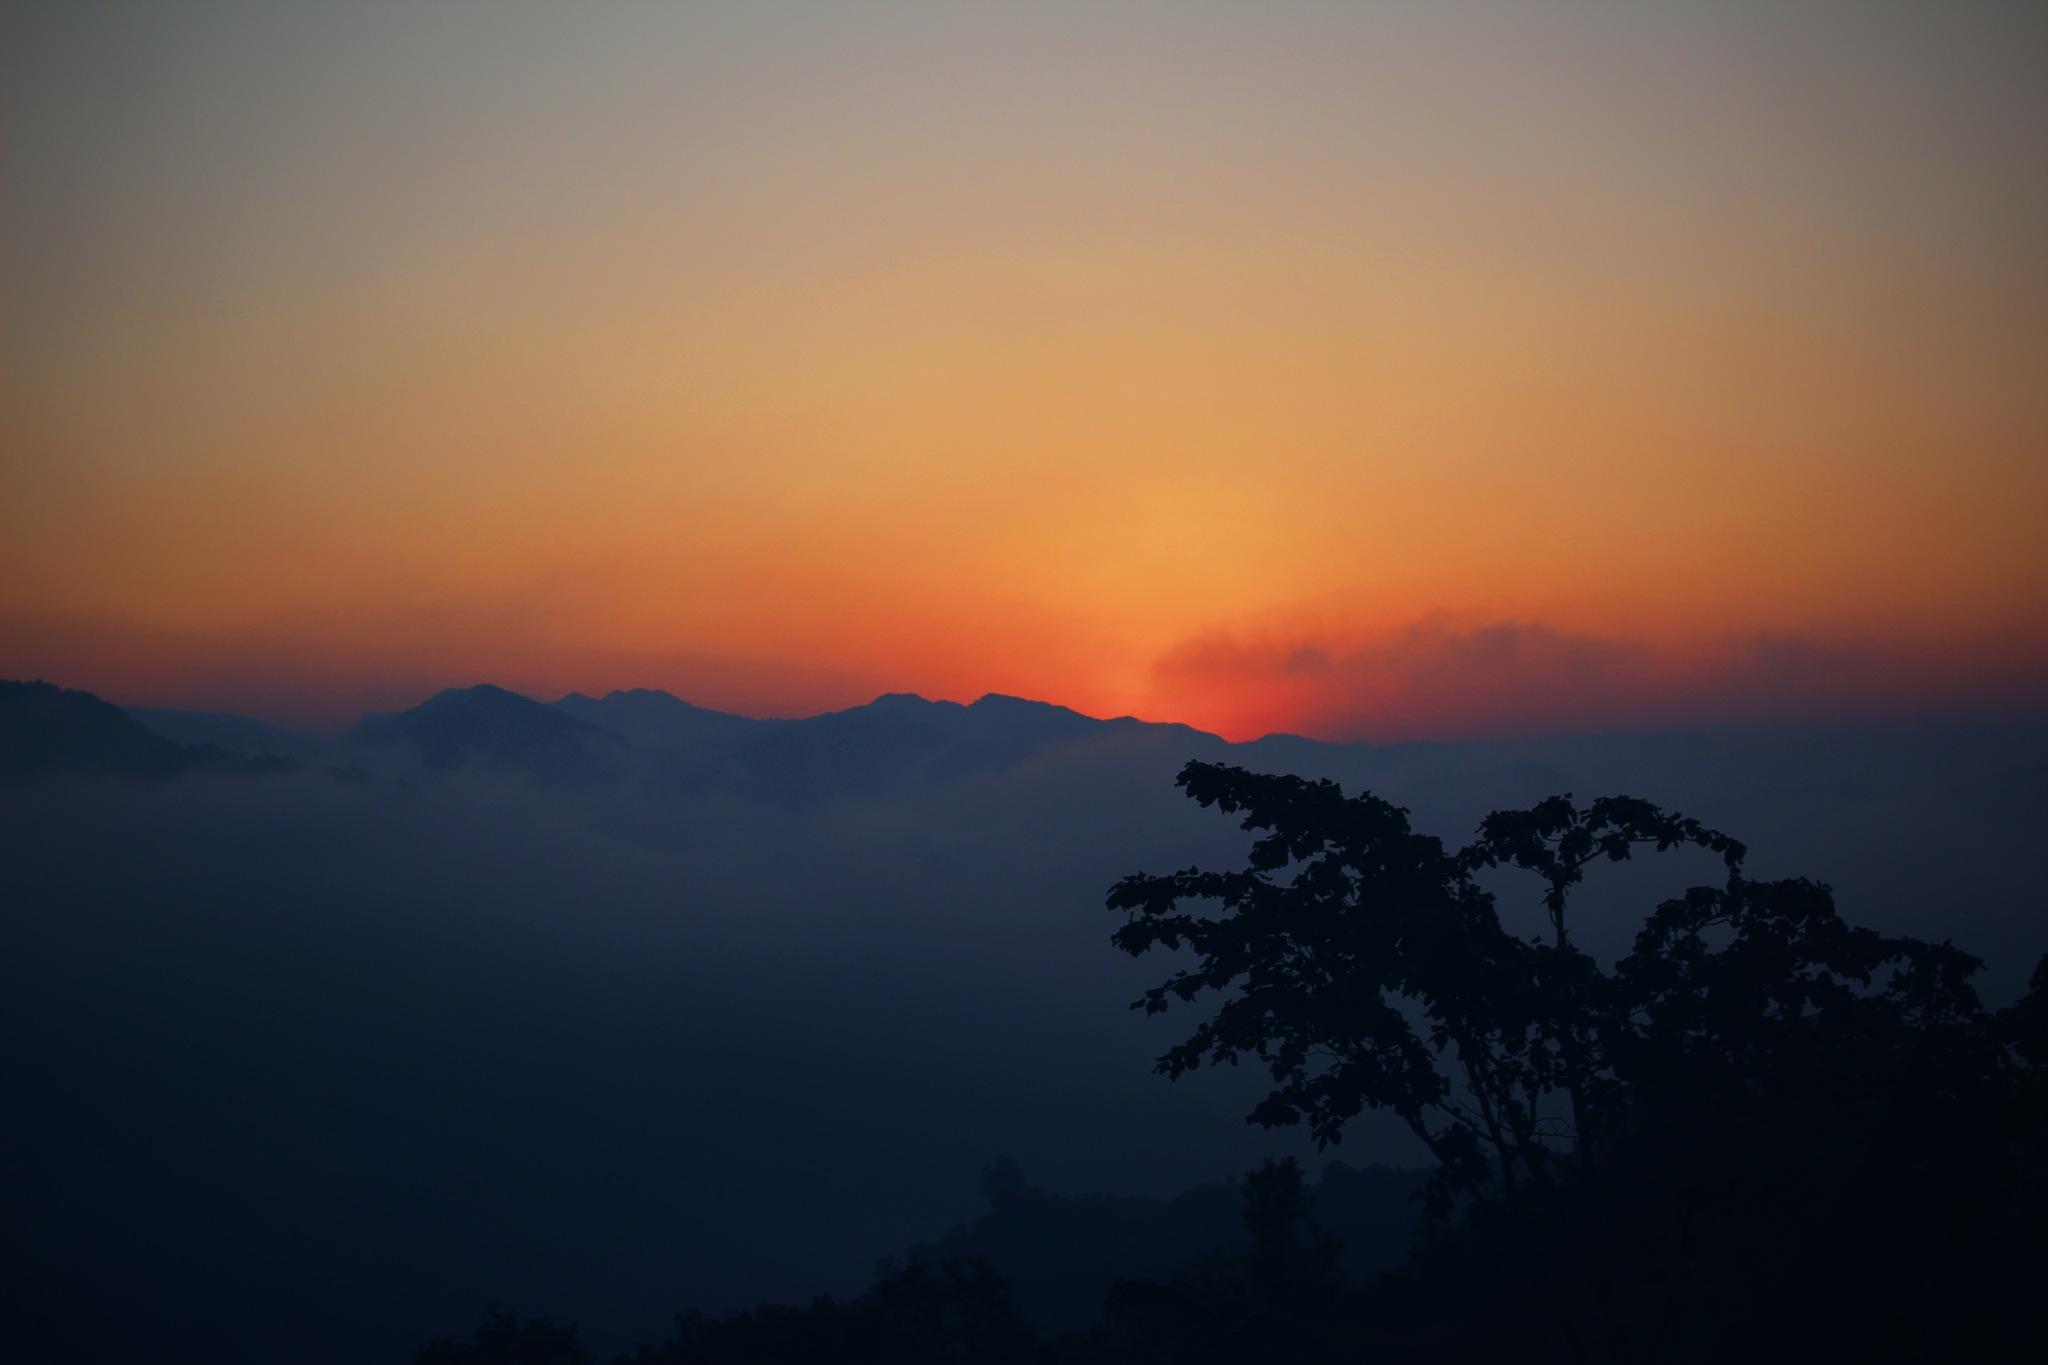 Heaven by Swati Solanki